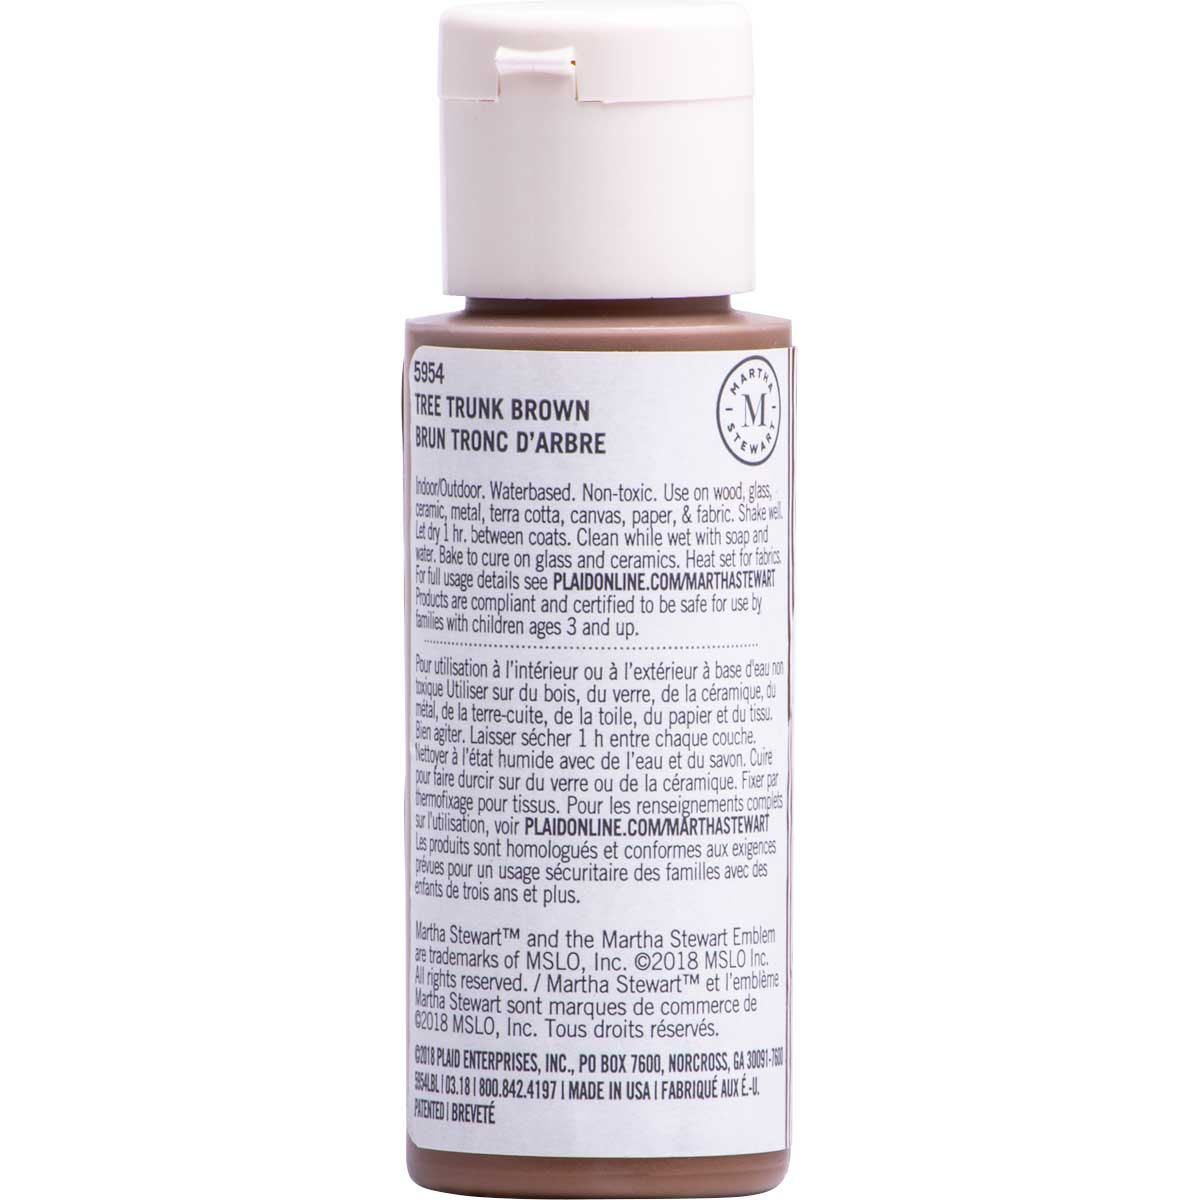 Martha Stewart ® Multi-Surface Satin Acrylic Craft Paint CPSIA - Tree Trunk Brown, 2 oz. - 5954